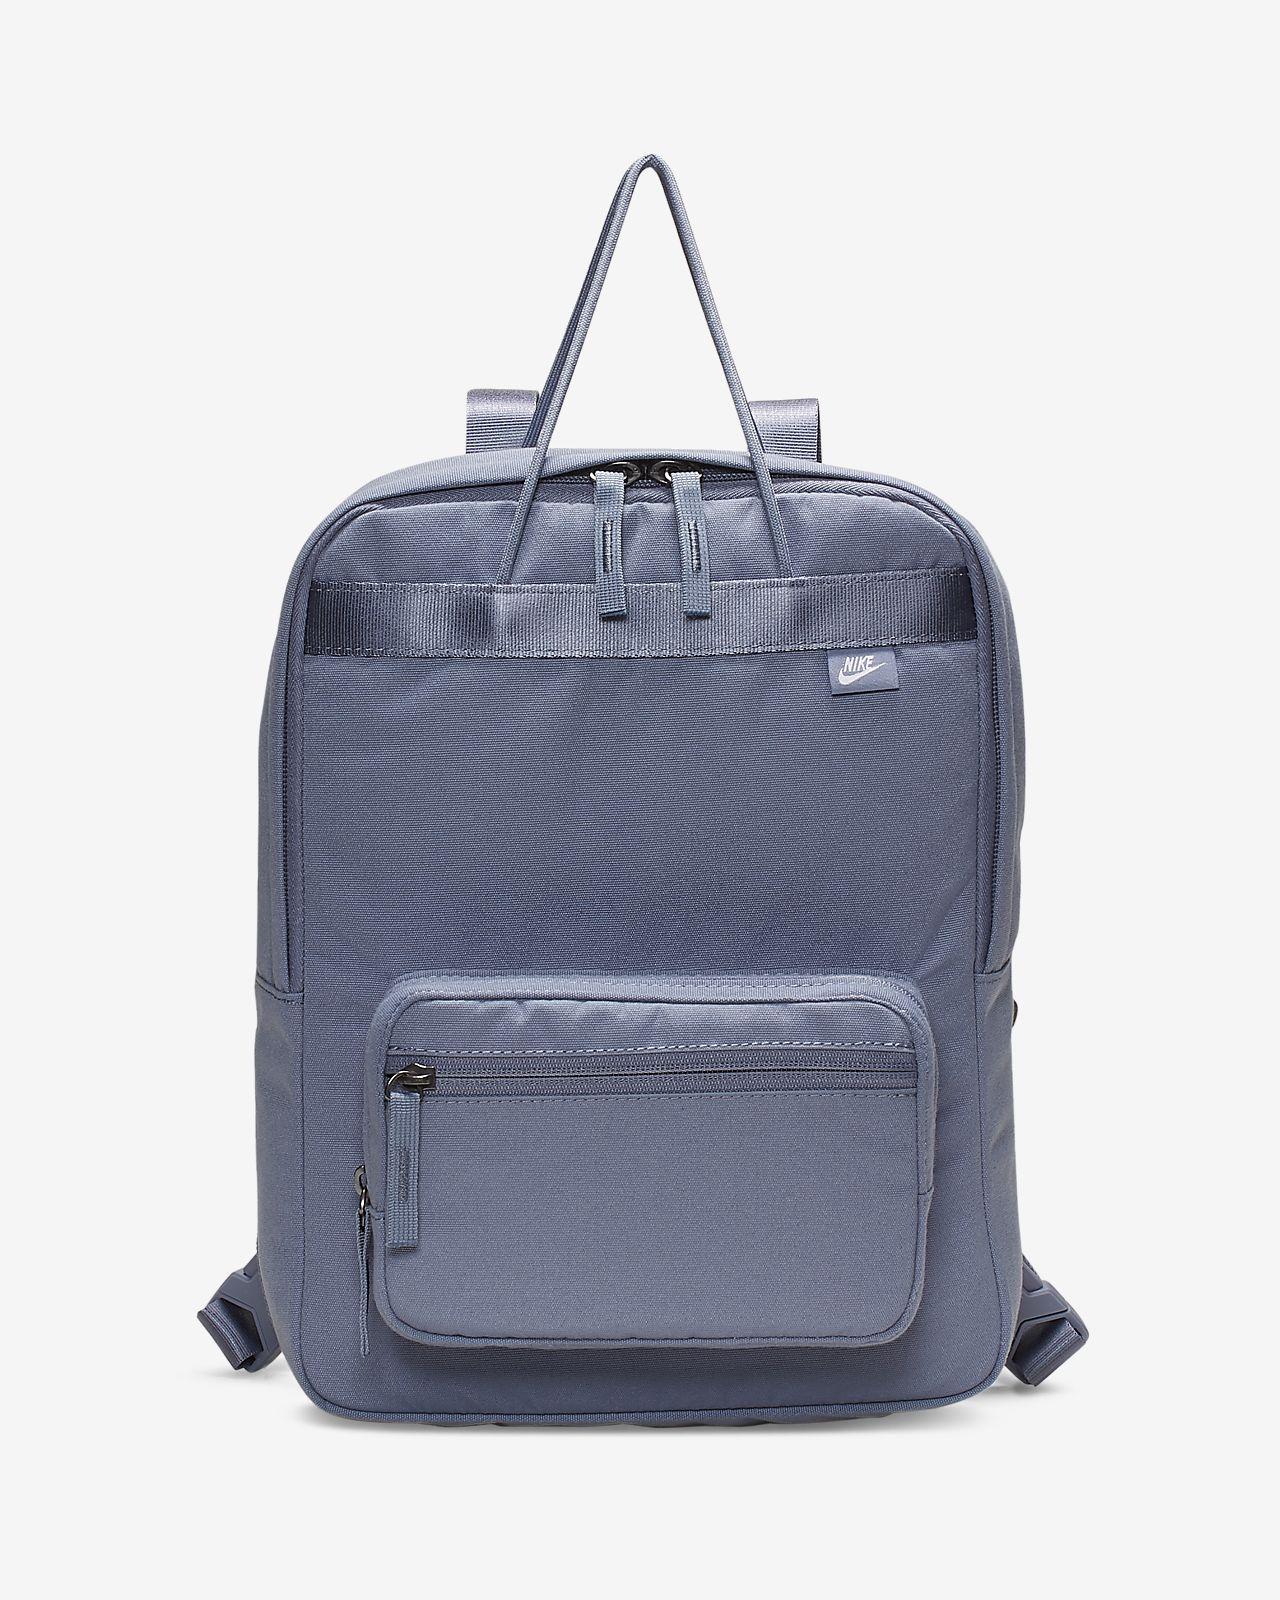 Plecak dziecięcy Premium Nike Tanjun